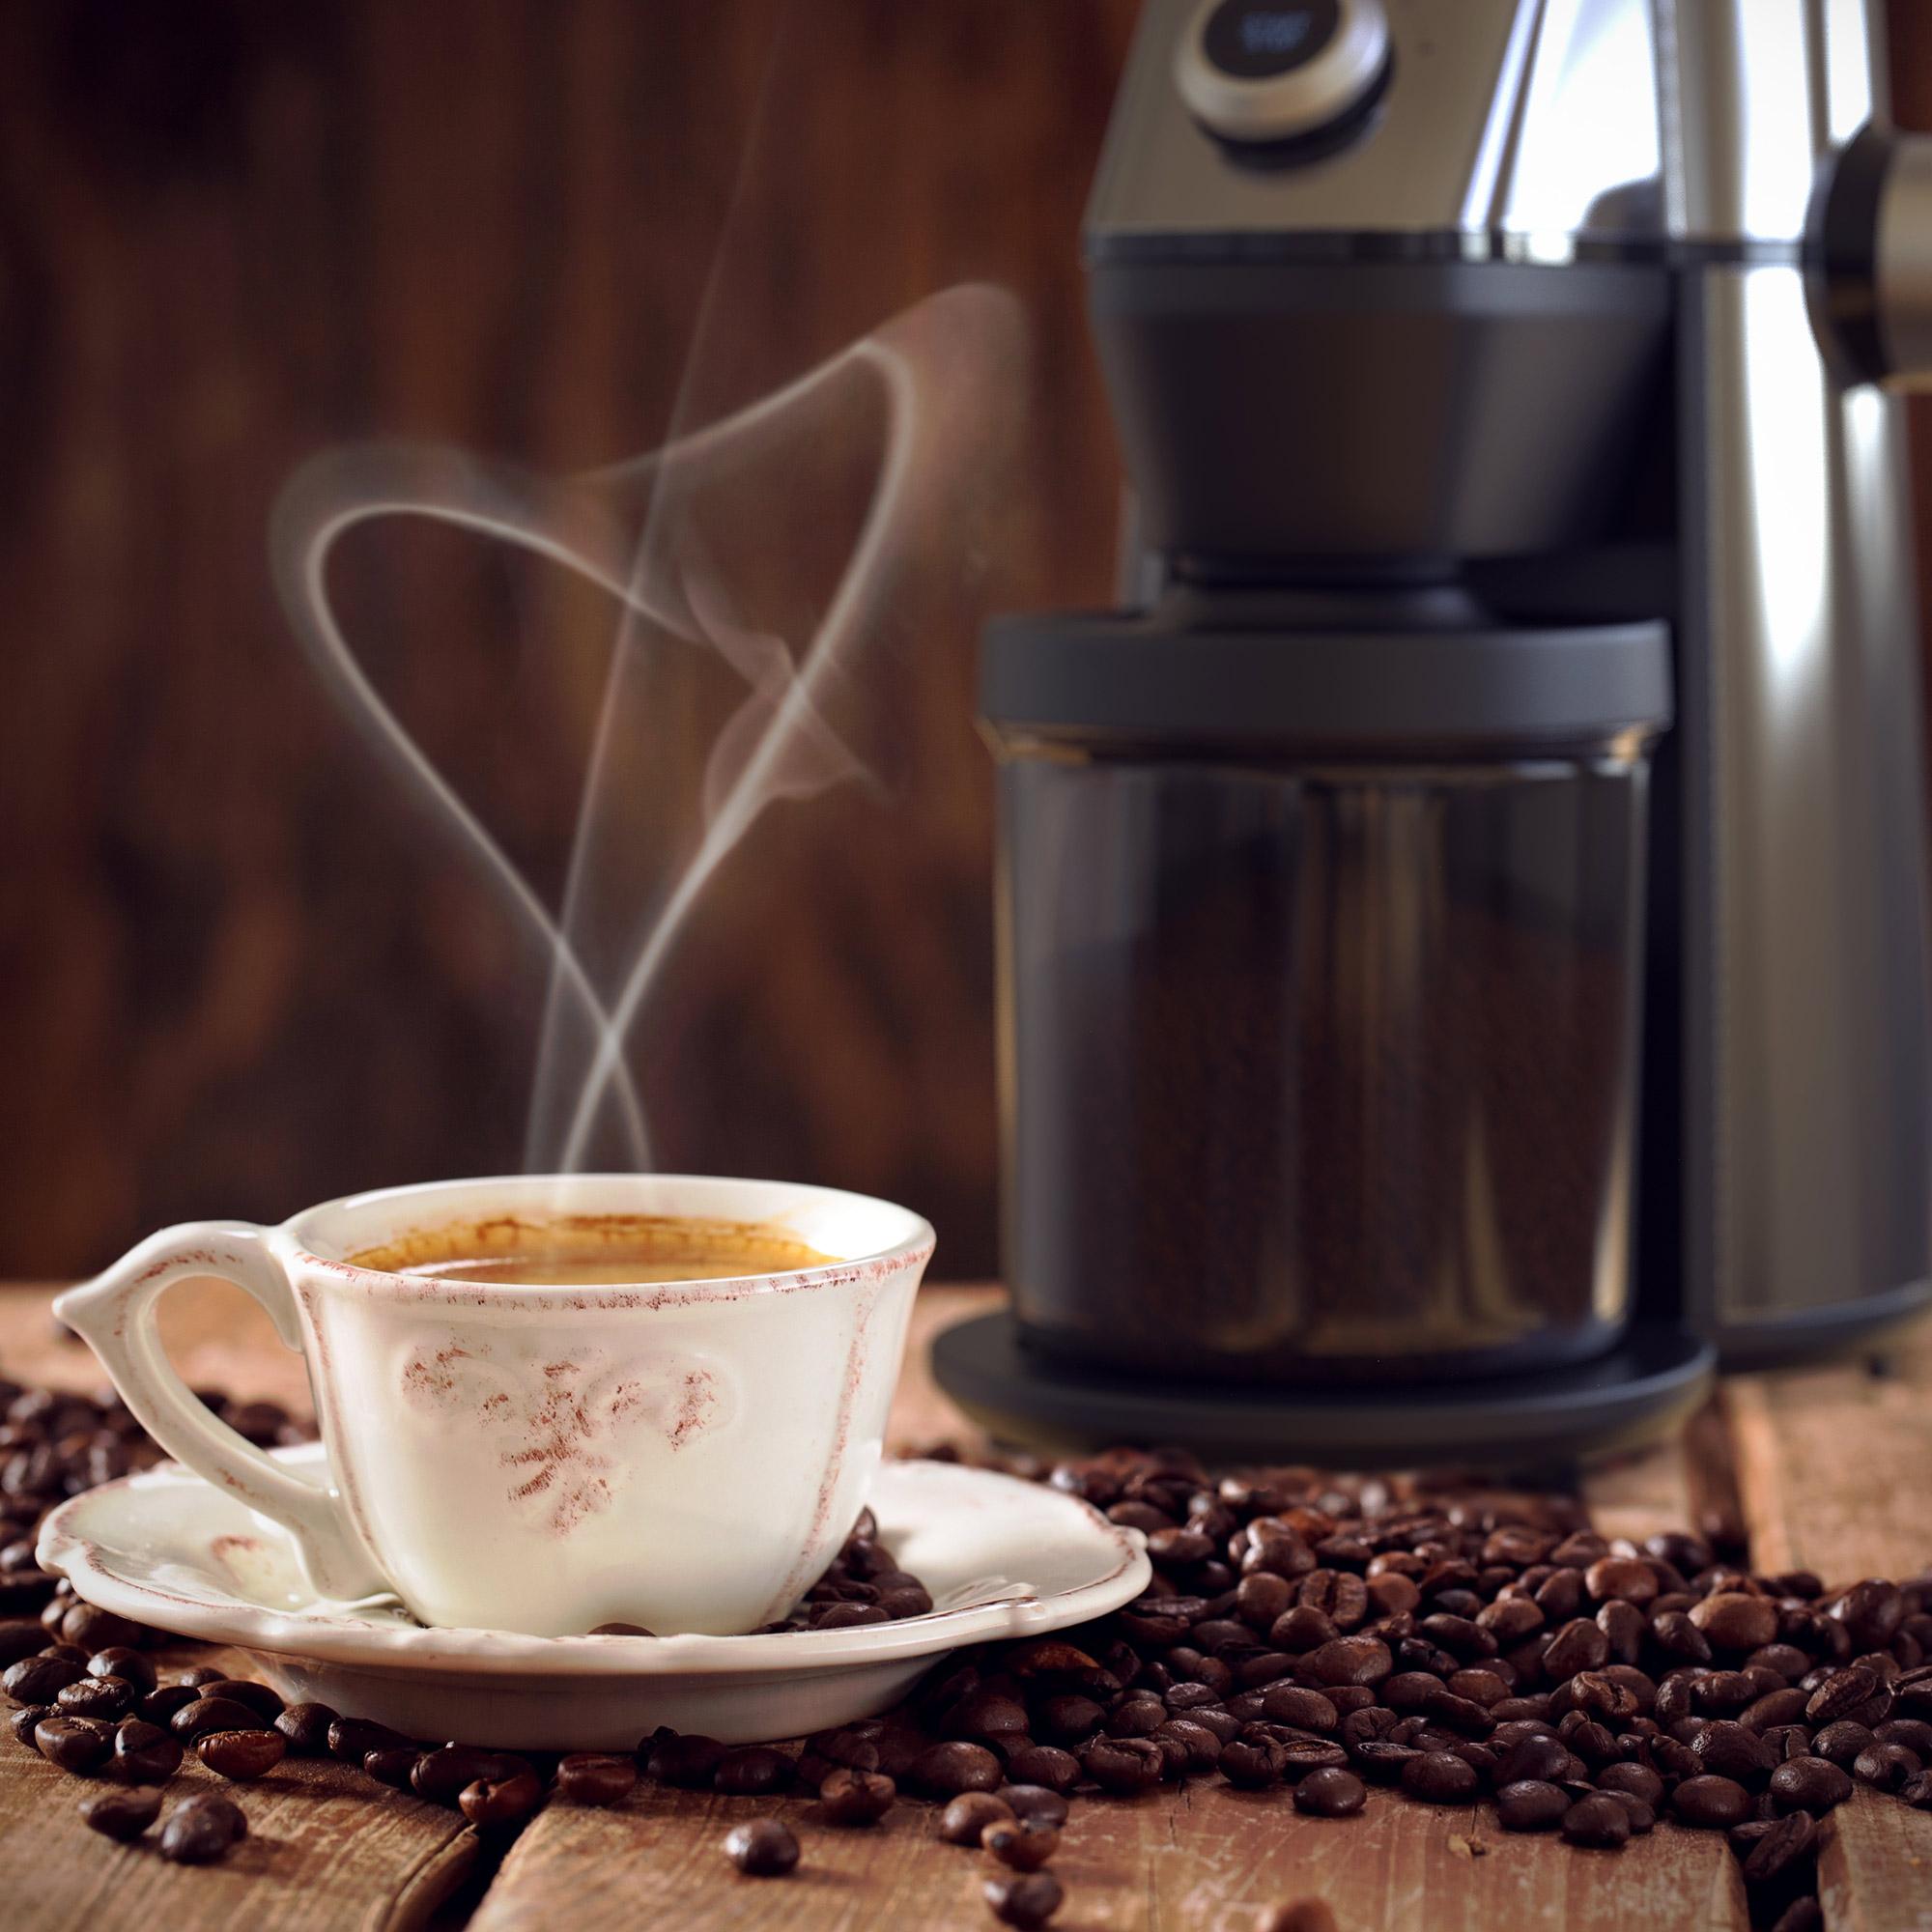 303236_Kaffeemuehle_Anwendung-NEU.jpg